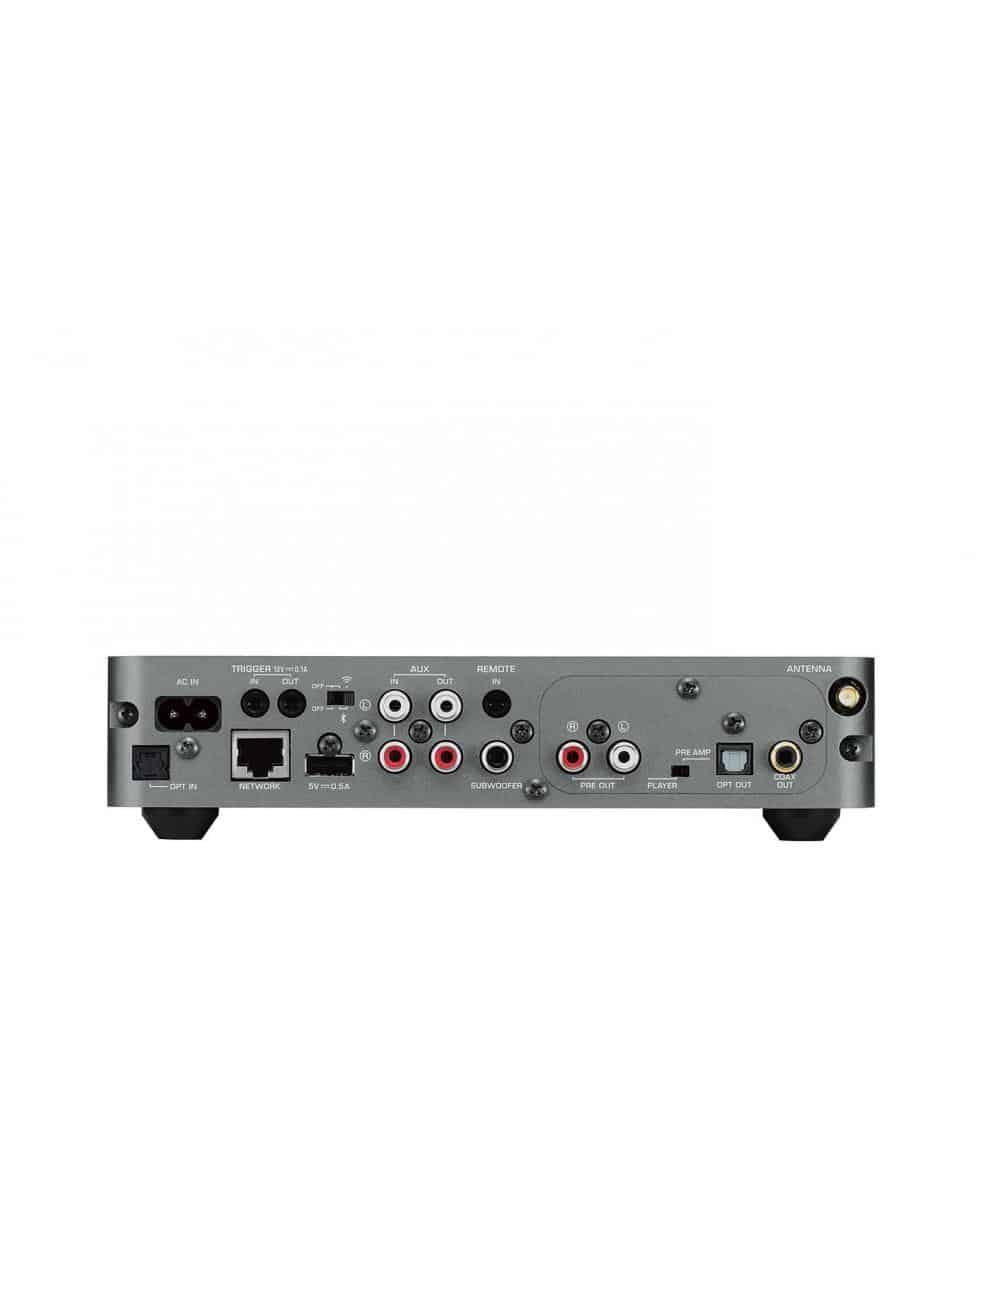 Amplificatore streaming wireless, Yamaha MusicCast WXC-50 compatibile servizio musicale in streaming, connessioni.